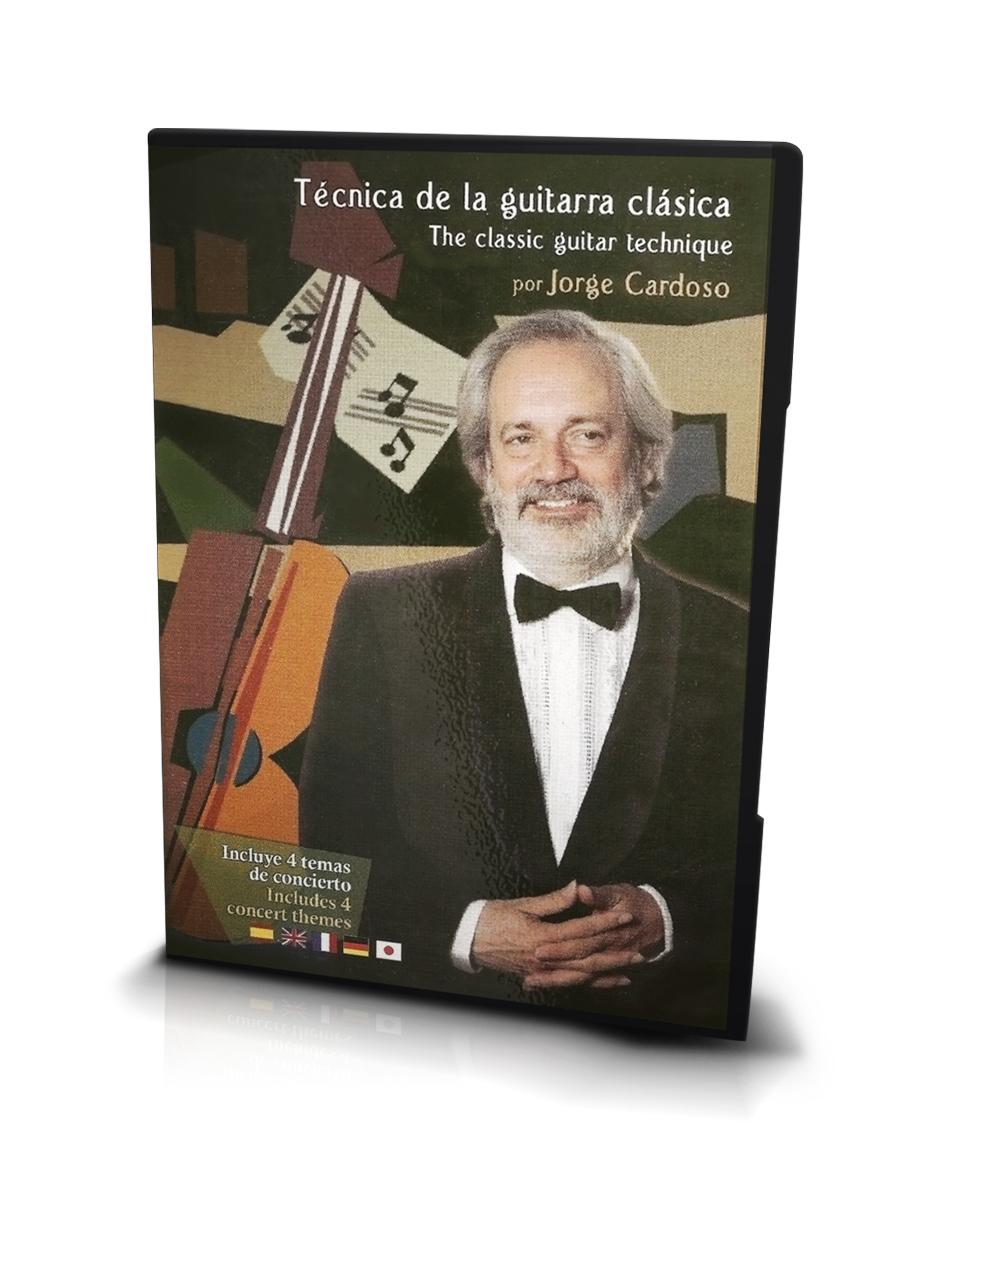 Técnica de la Guitarra Clásica (Libro-DVD) Jorge Cardoso › DVD Otros ...